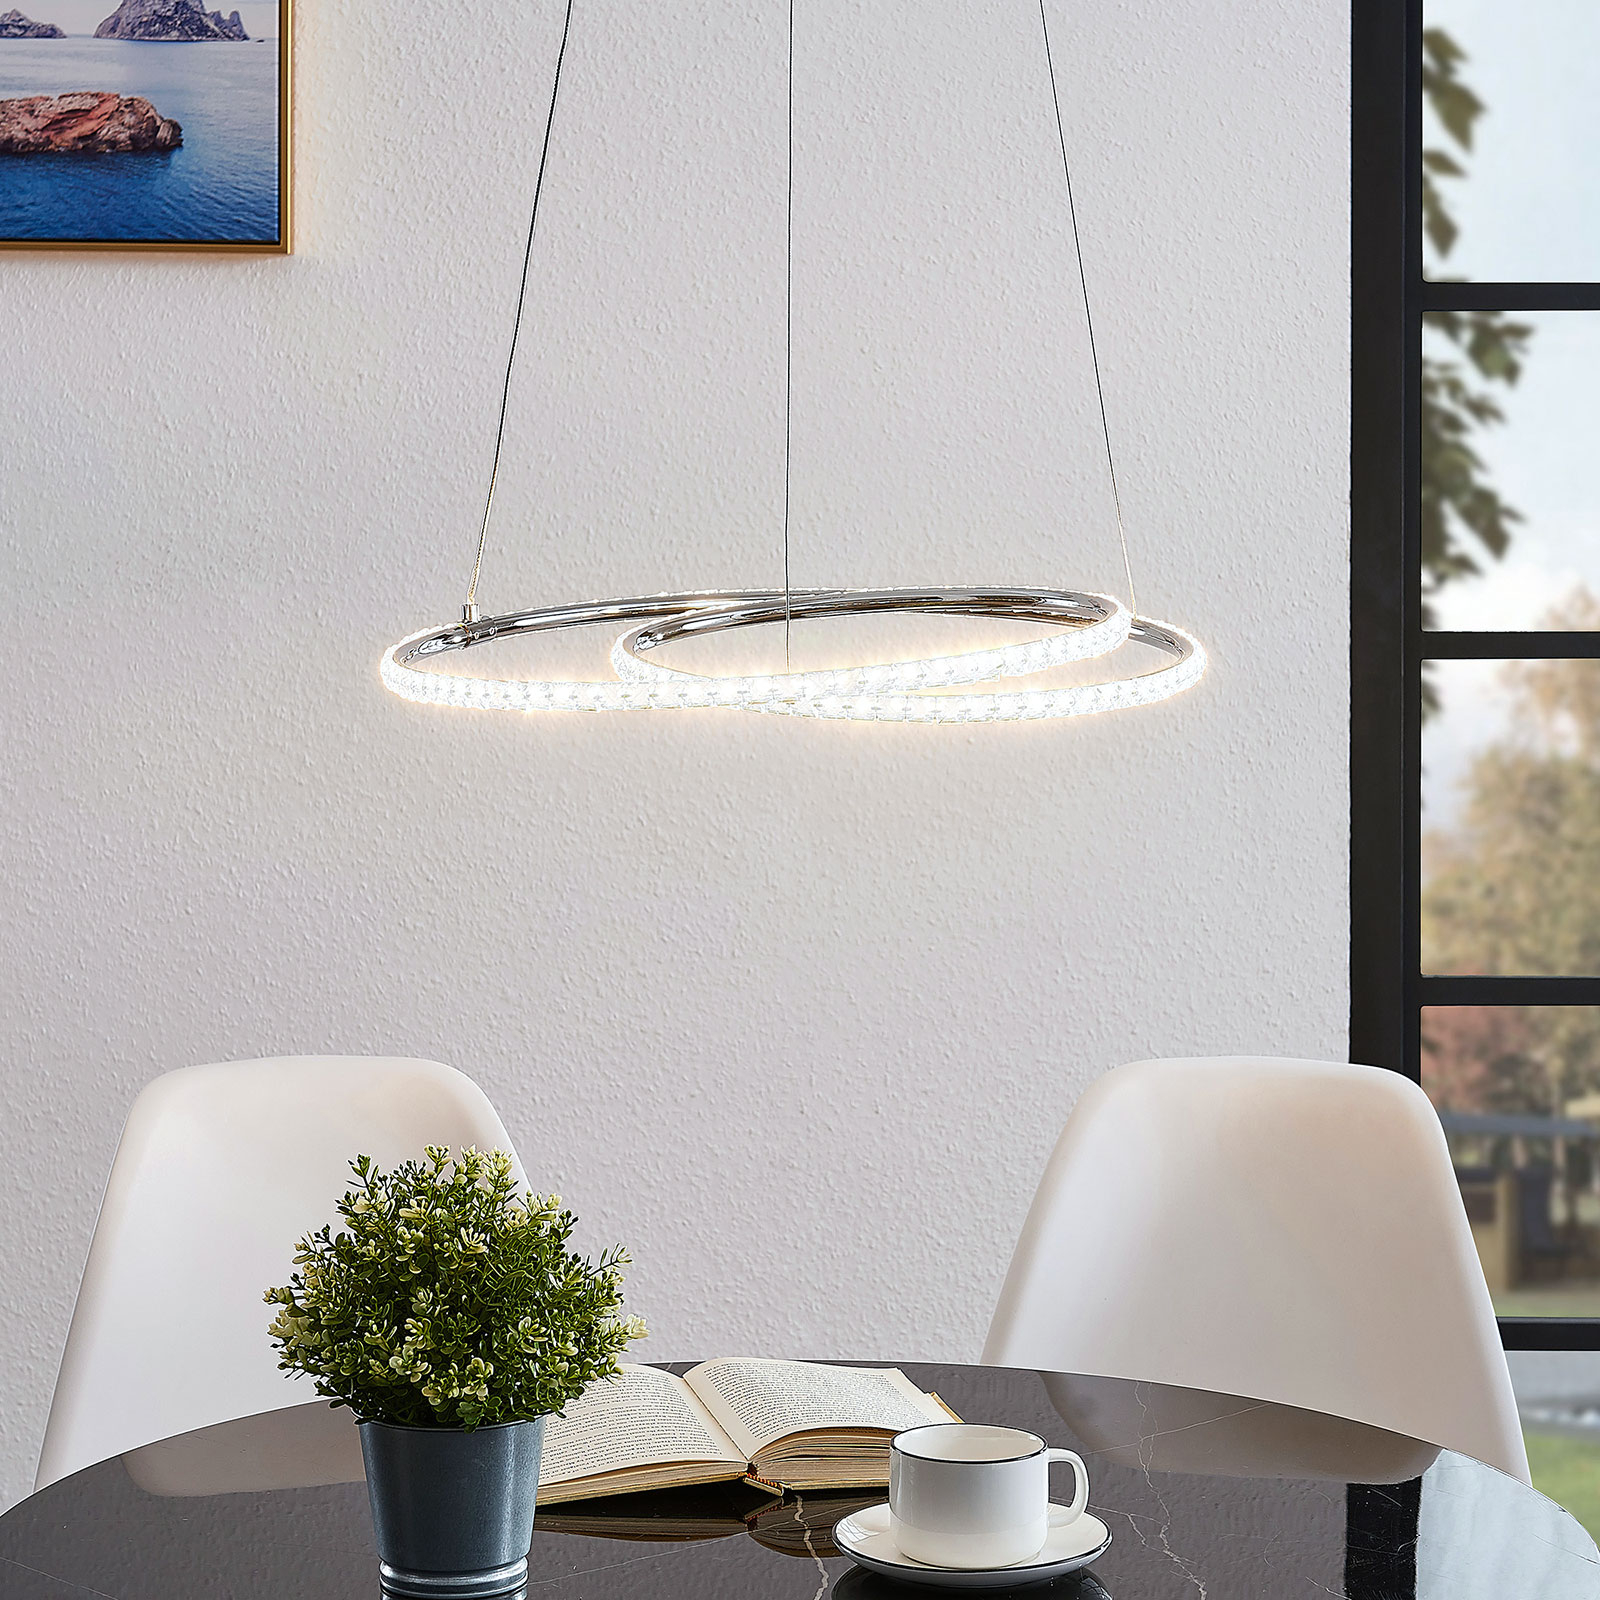 Lindby Lucy LED-riippuvalaisin, 45 cm, kristalli